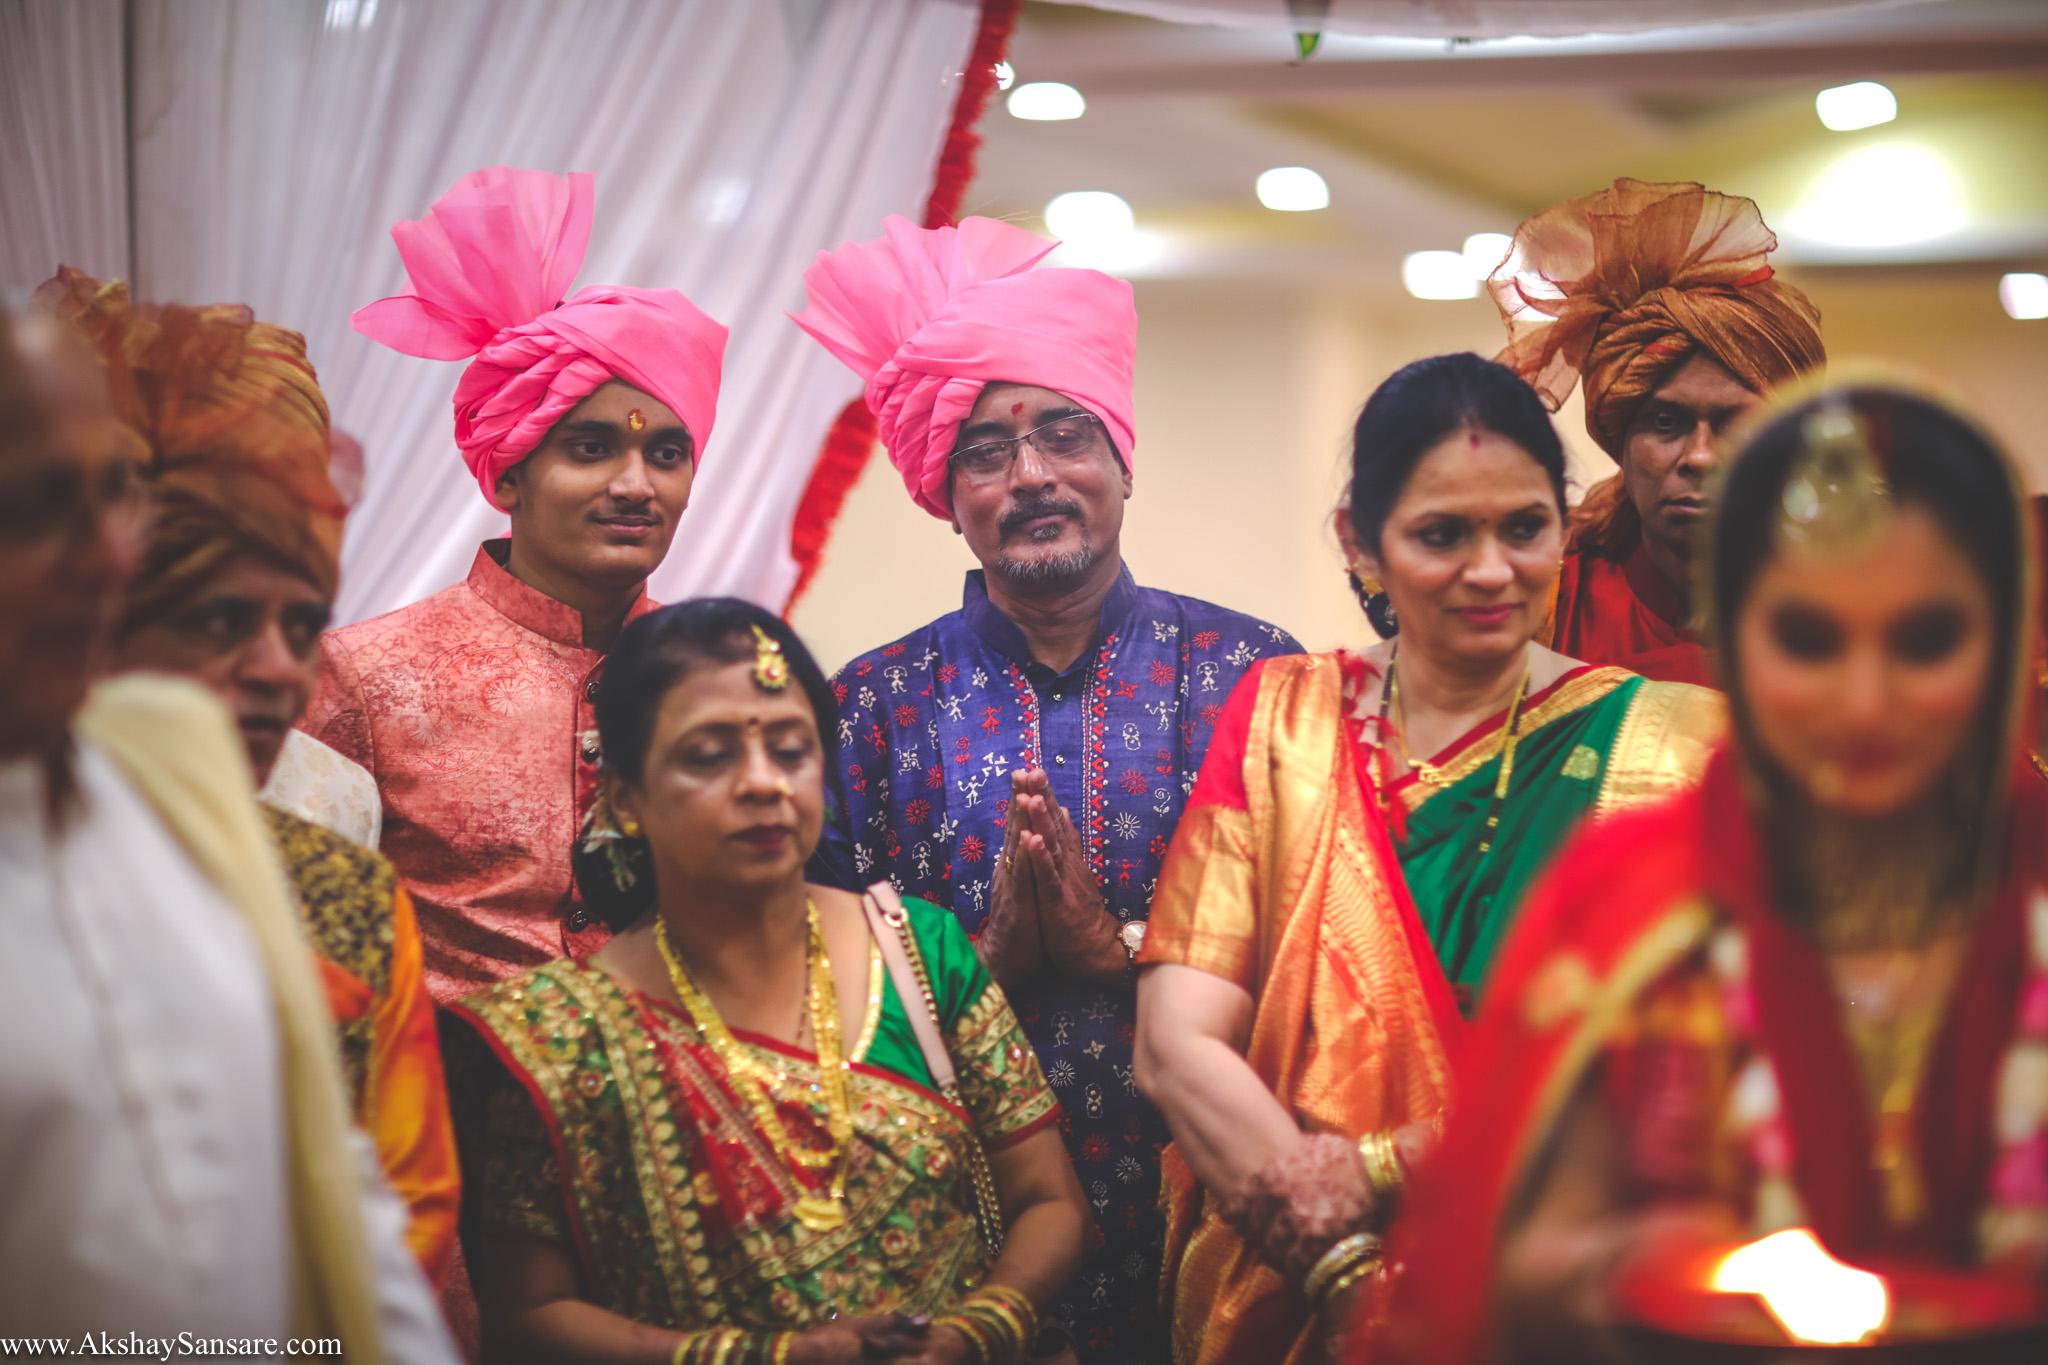 Akshay Sansare Photography Kunal x Shrutika best candid photographers in mumbai(56).jpg